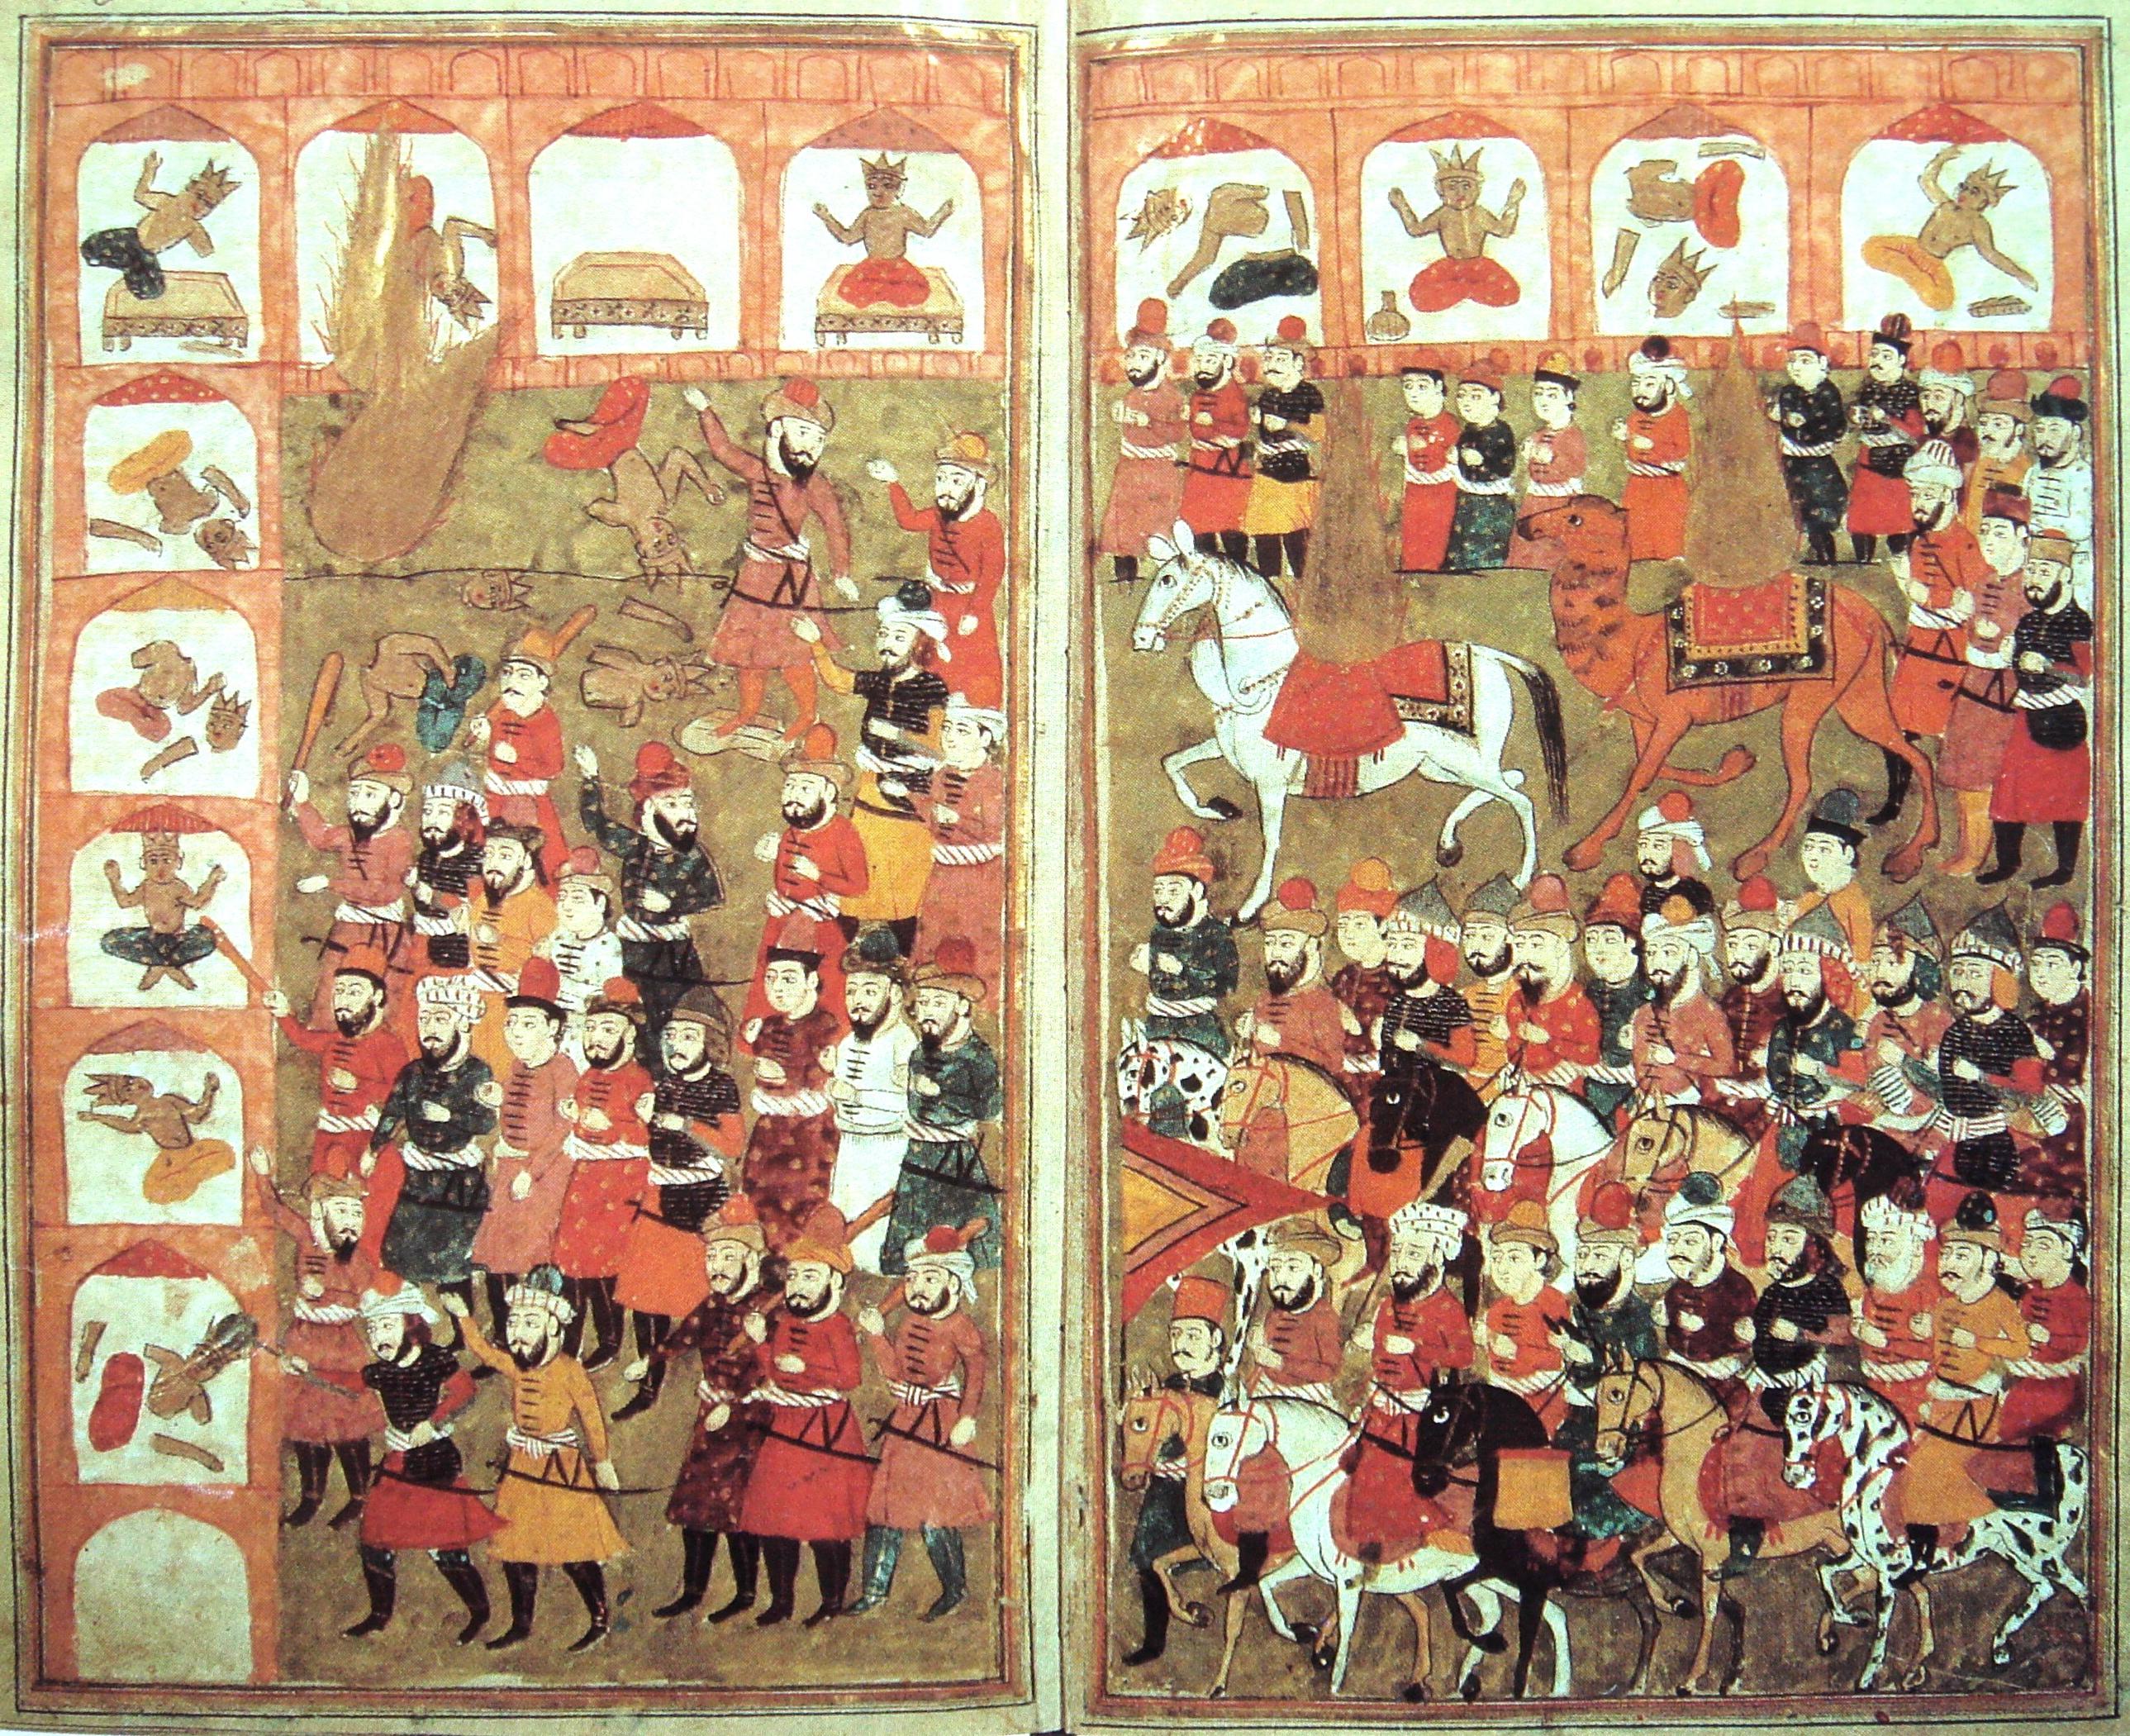 http://upload.wikimedia.org/wikipedia/commons/c/ca/Muhammad_destroying_idols_-_L%27Histoire_Merveilleuse_en_Vers_de_Mahomet_BNF.jpg